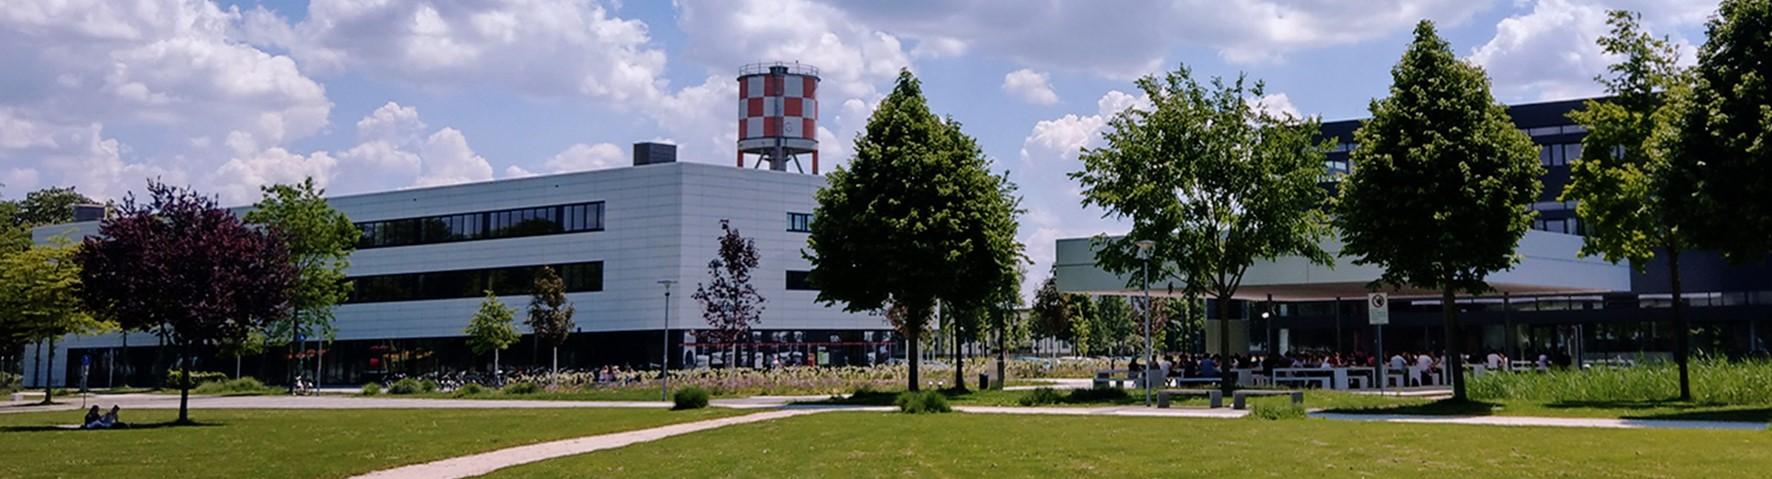 Fotografie Hochschule Neu-Ulm